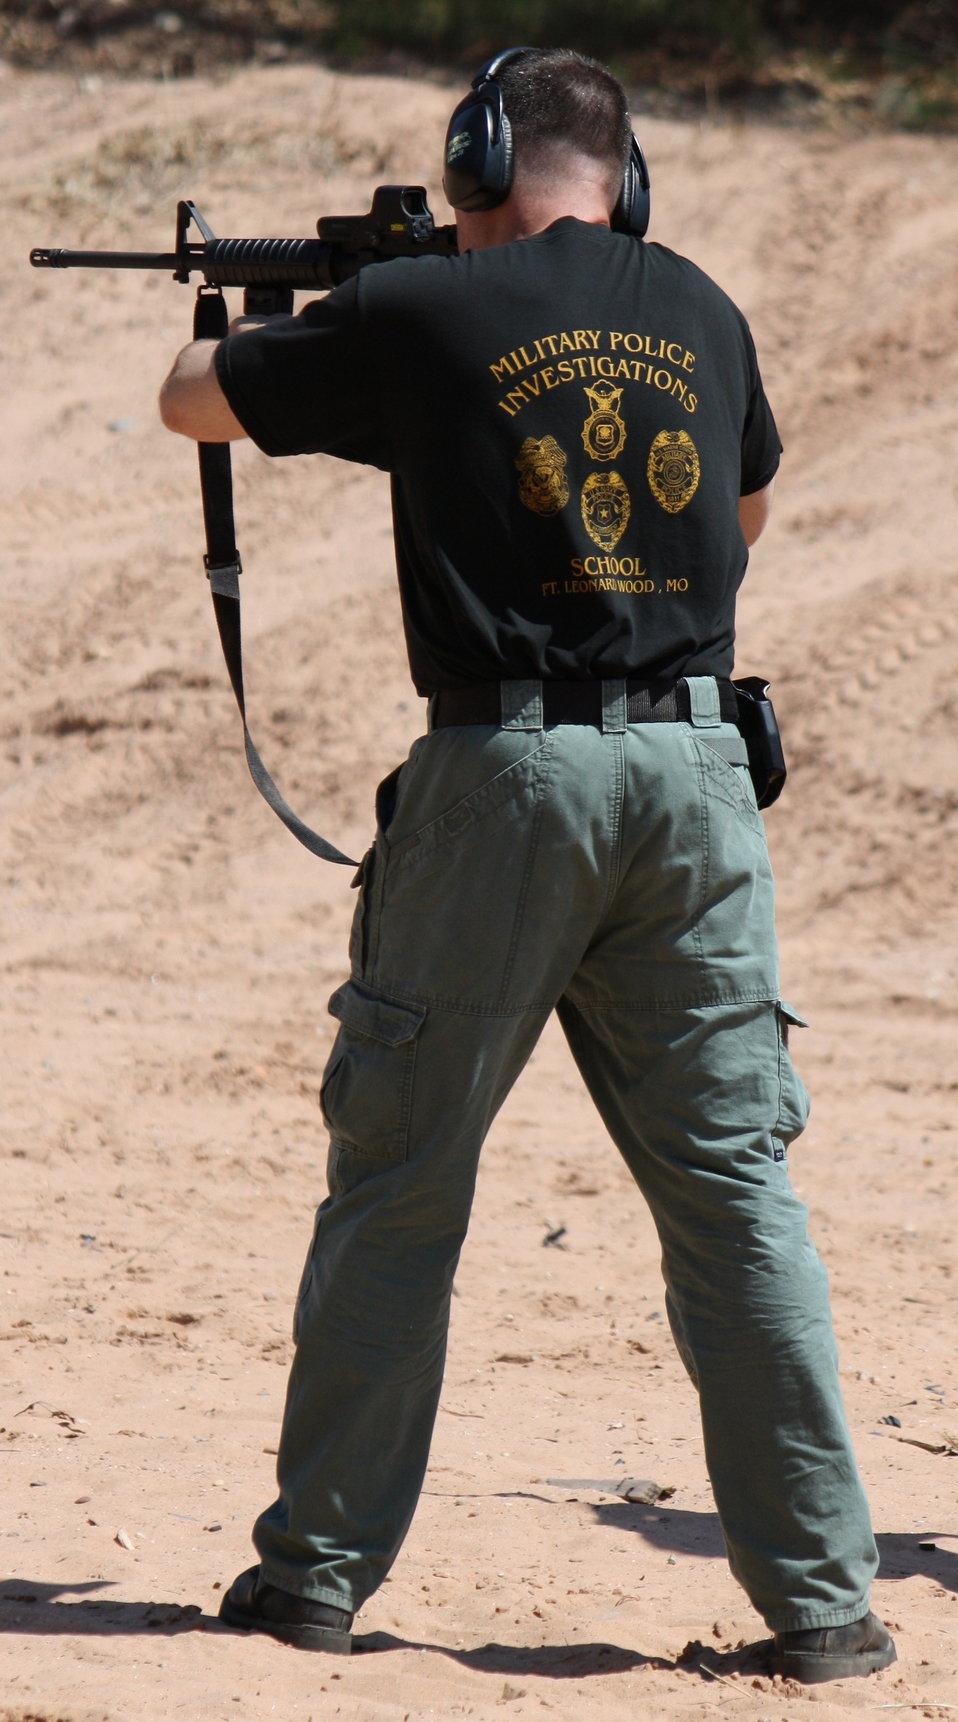 Special Agent Firing AR-15